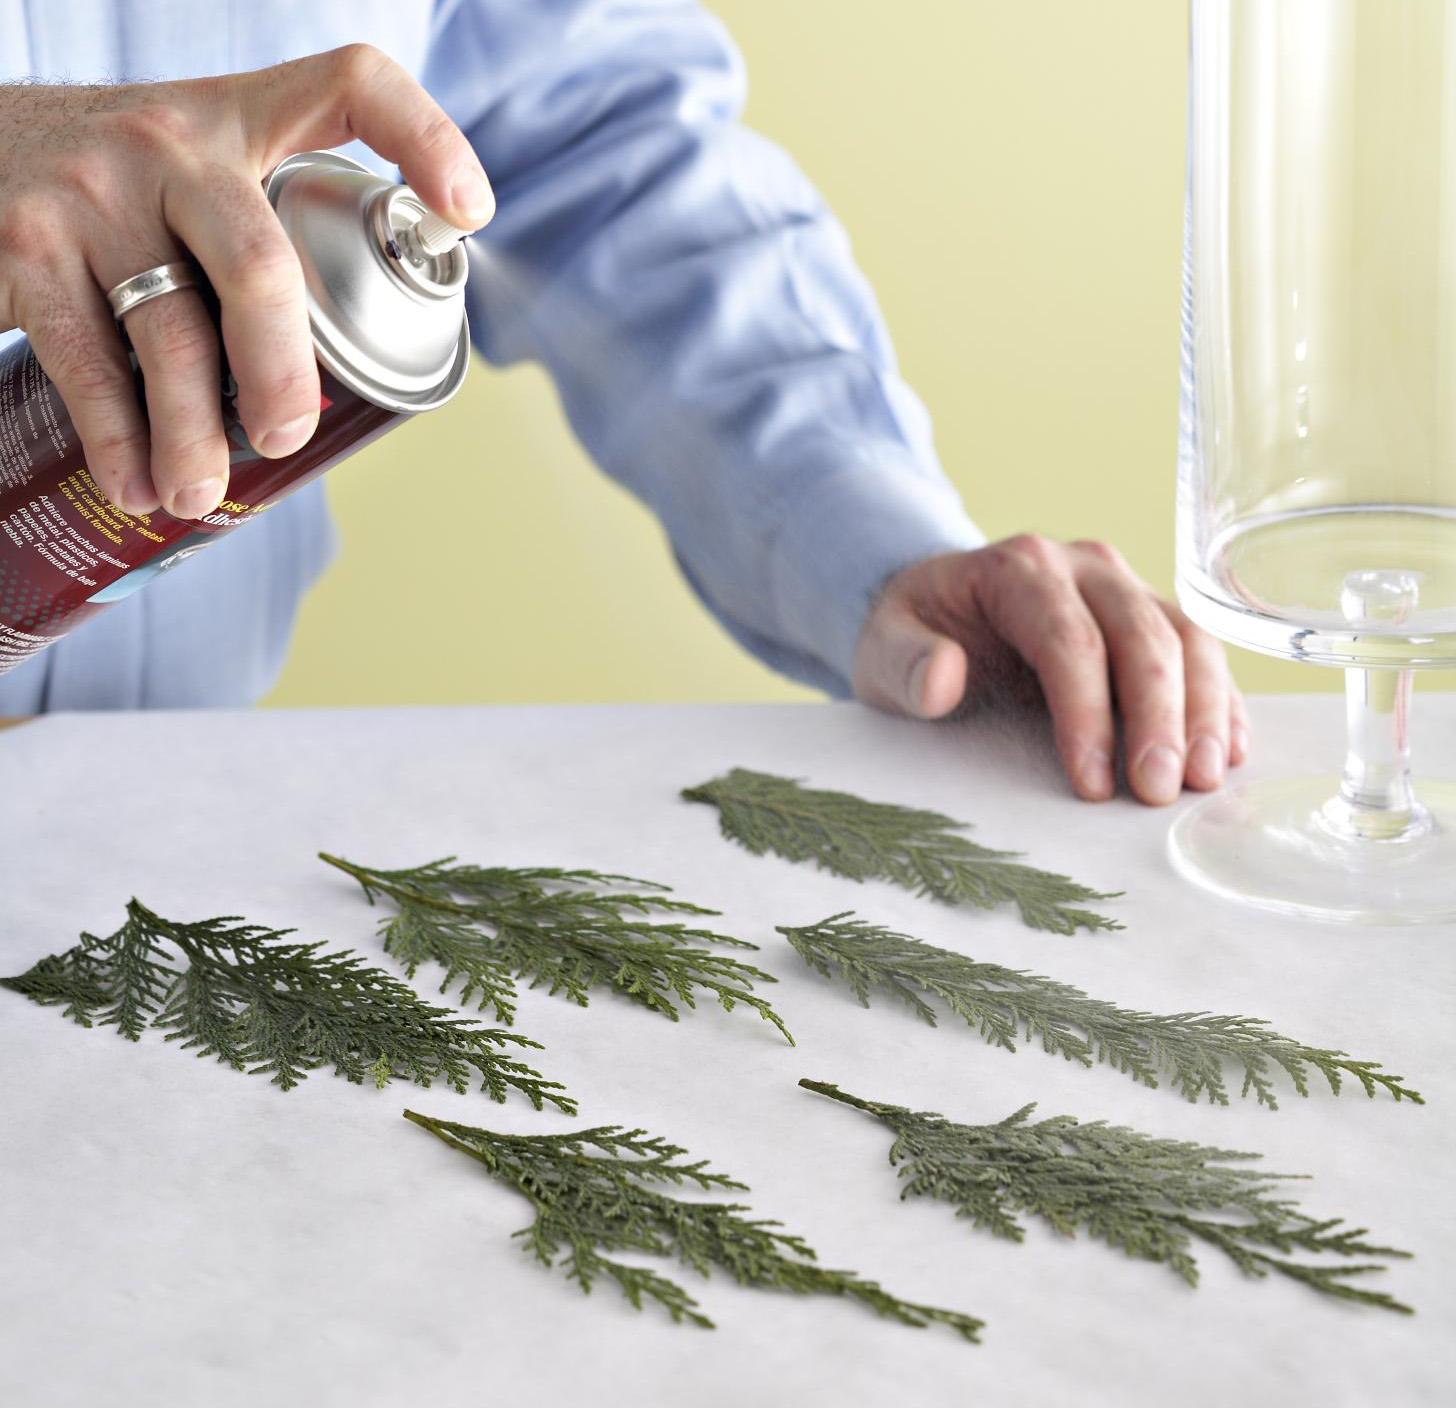 Step 1: Prep glass and greenery